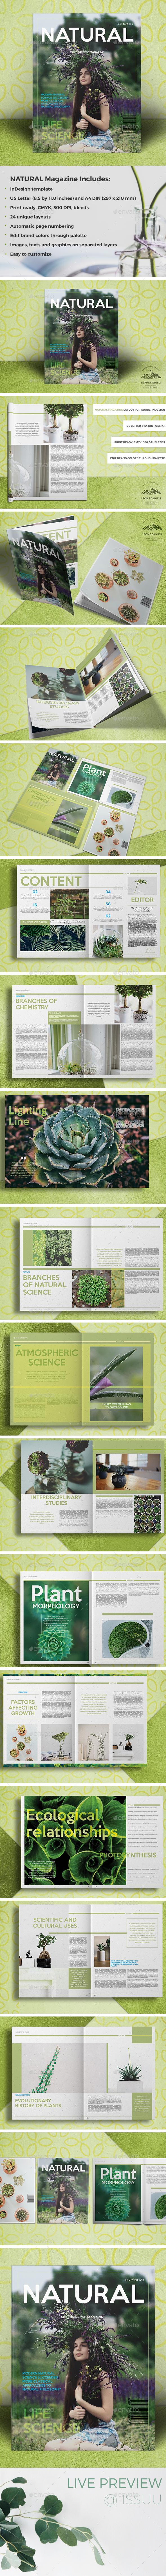 NATURAL Magazine - Magazines Print Templates